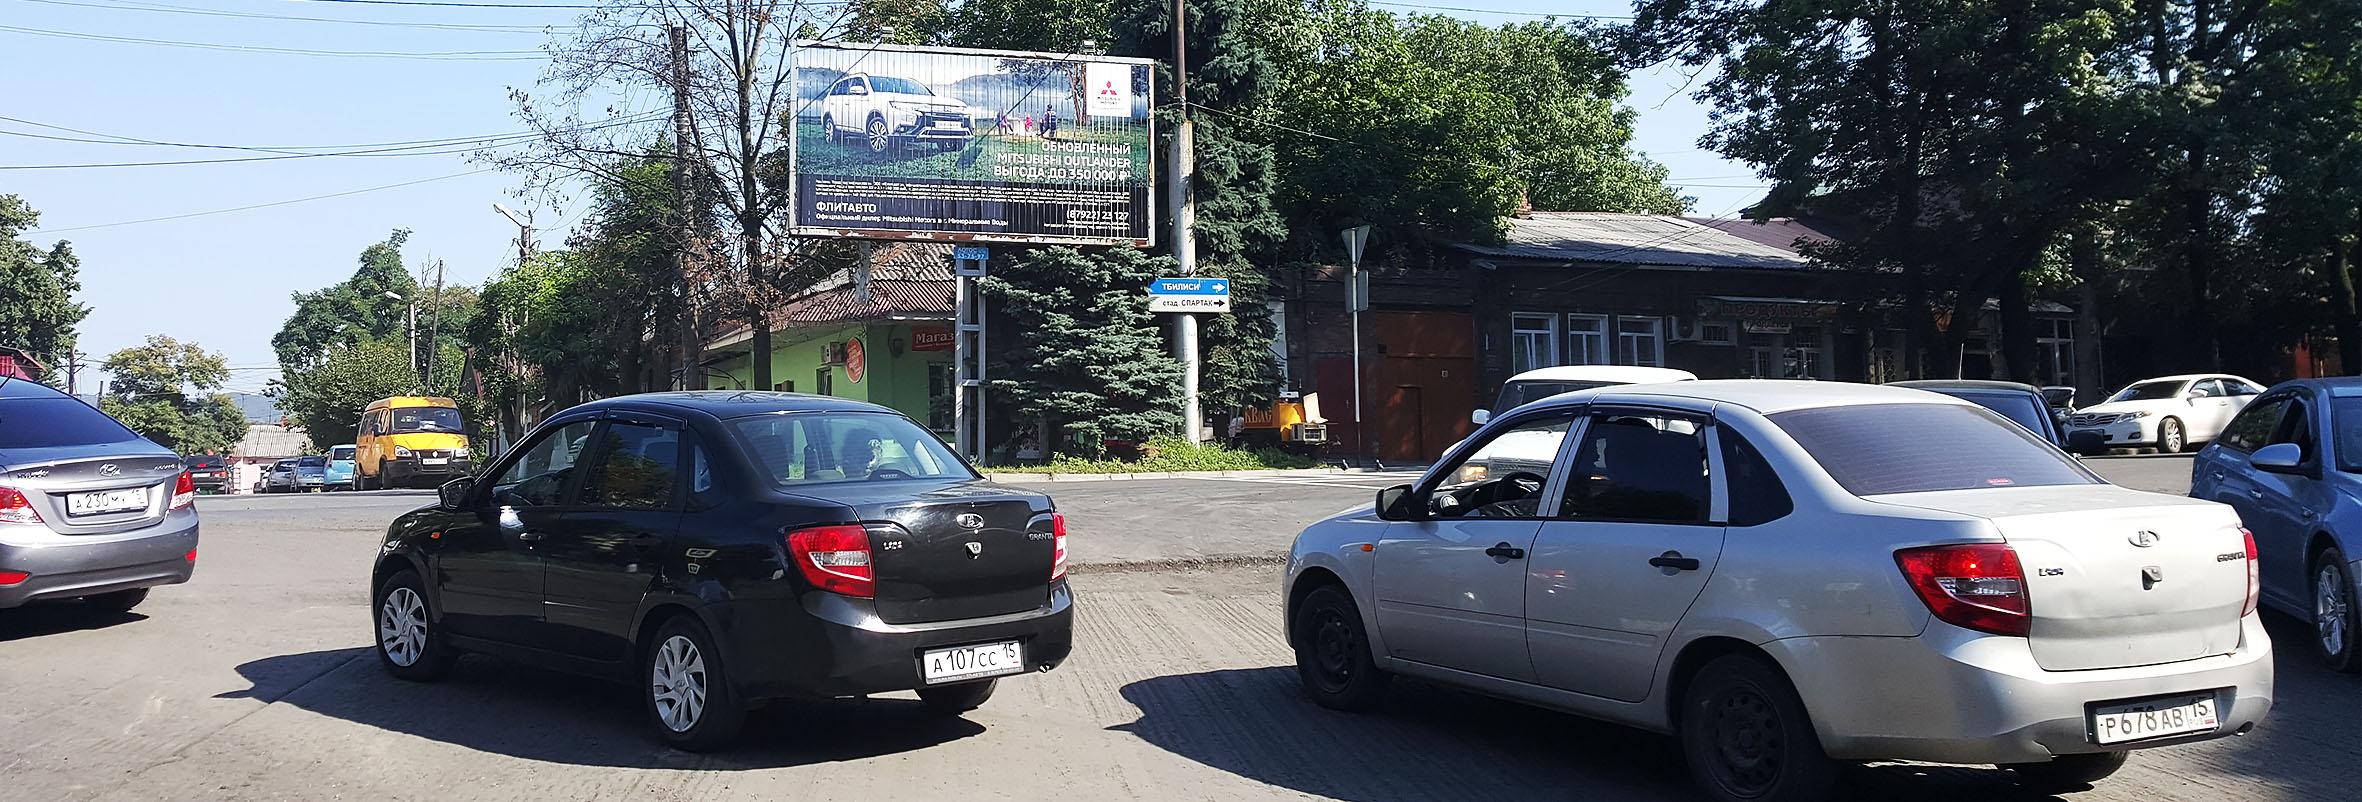 Реклама на билбордах в регионах Кавказа 3х6